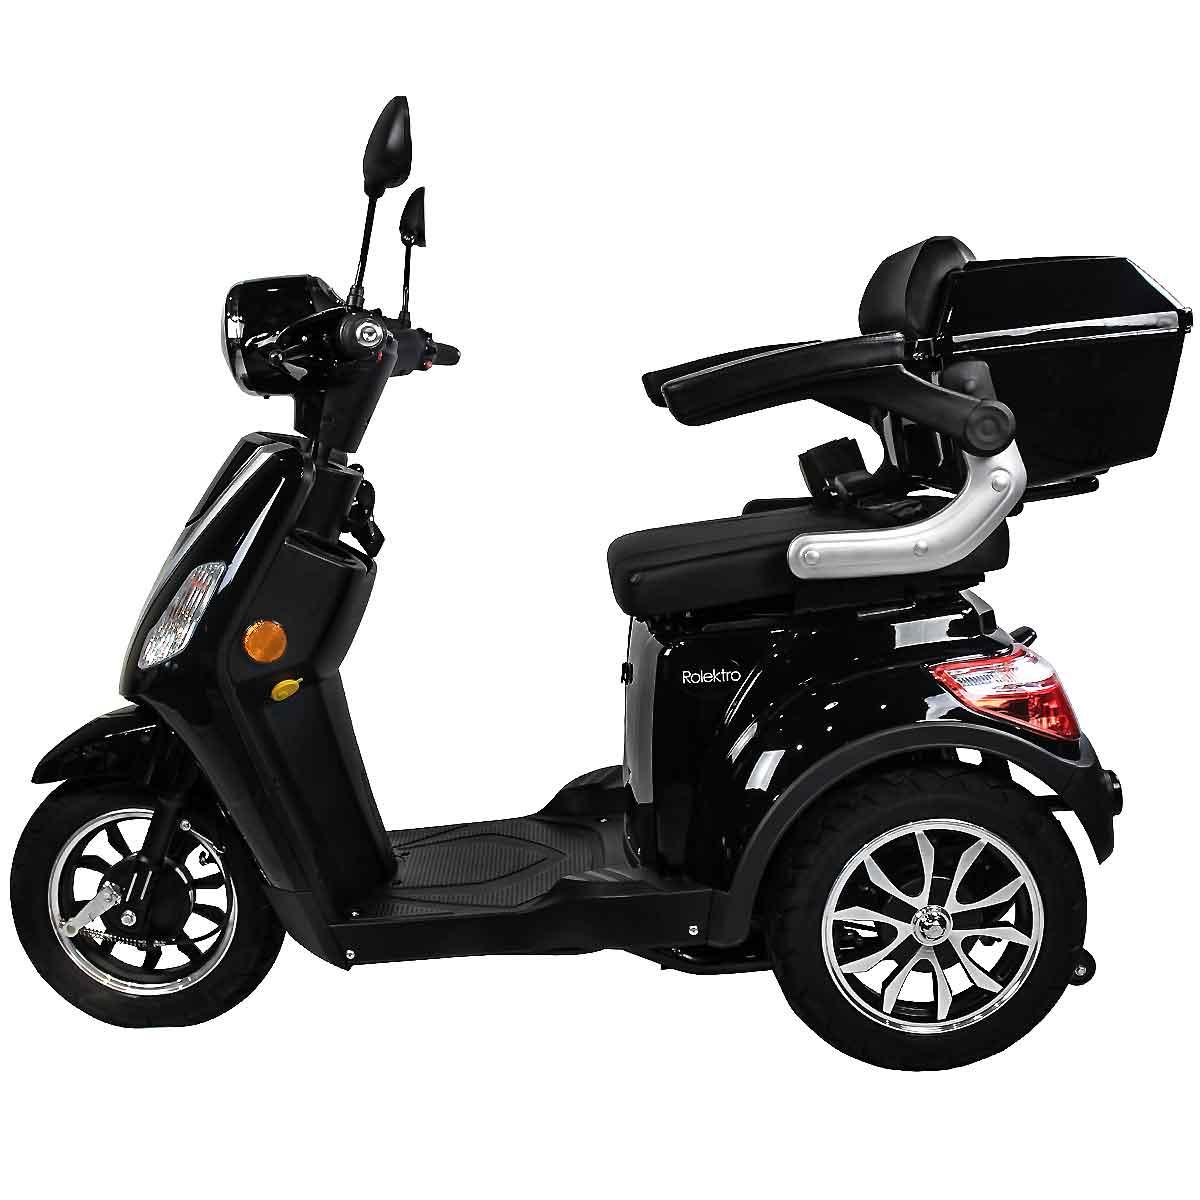 Seniorenmobil, Elektromobil, Elektrodreirad Rolektro 1000/30 schwarz Bild 2